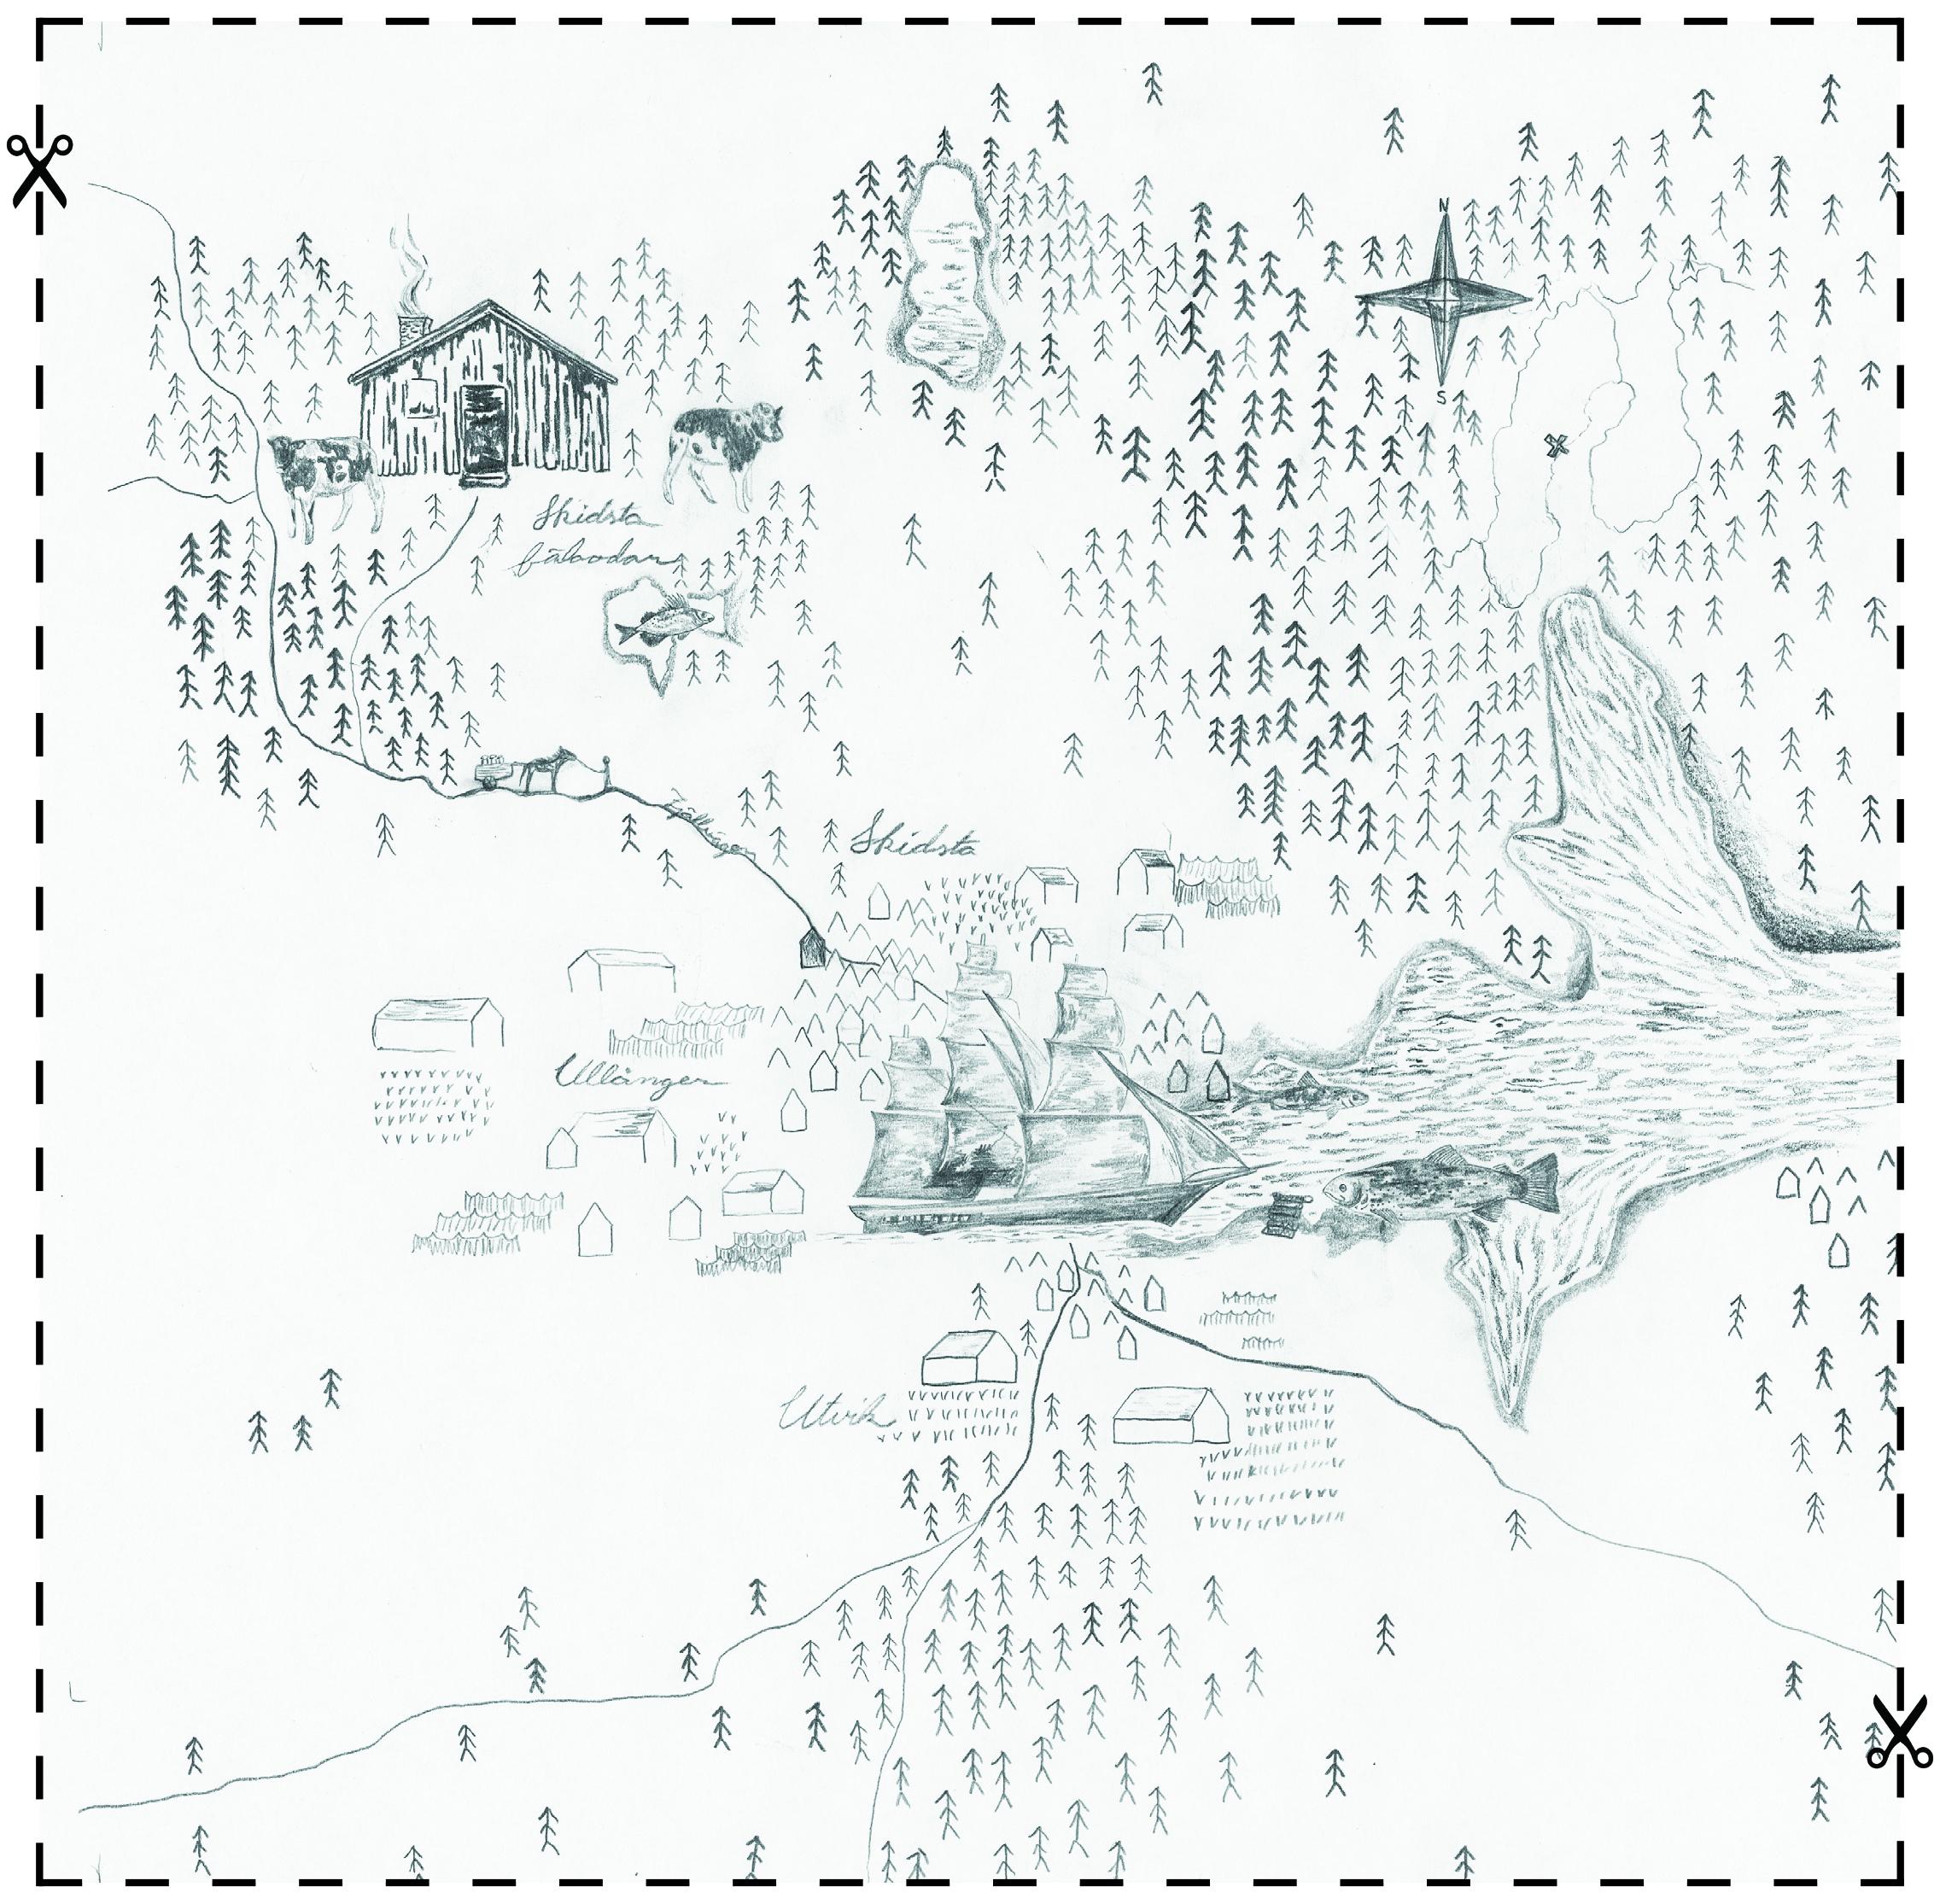 Illustrasjon: Marthe Kulseth og Nils Ställborn